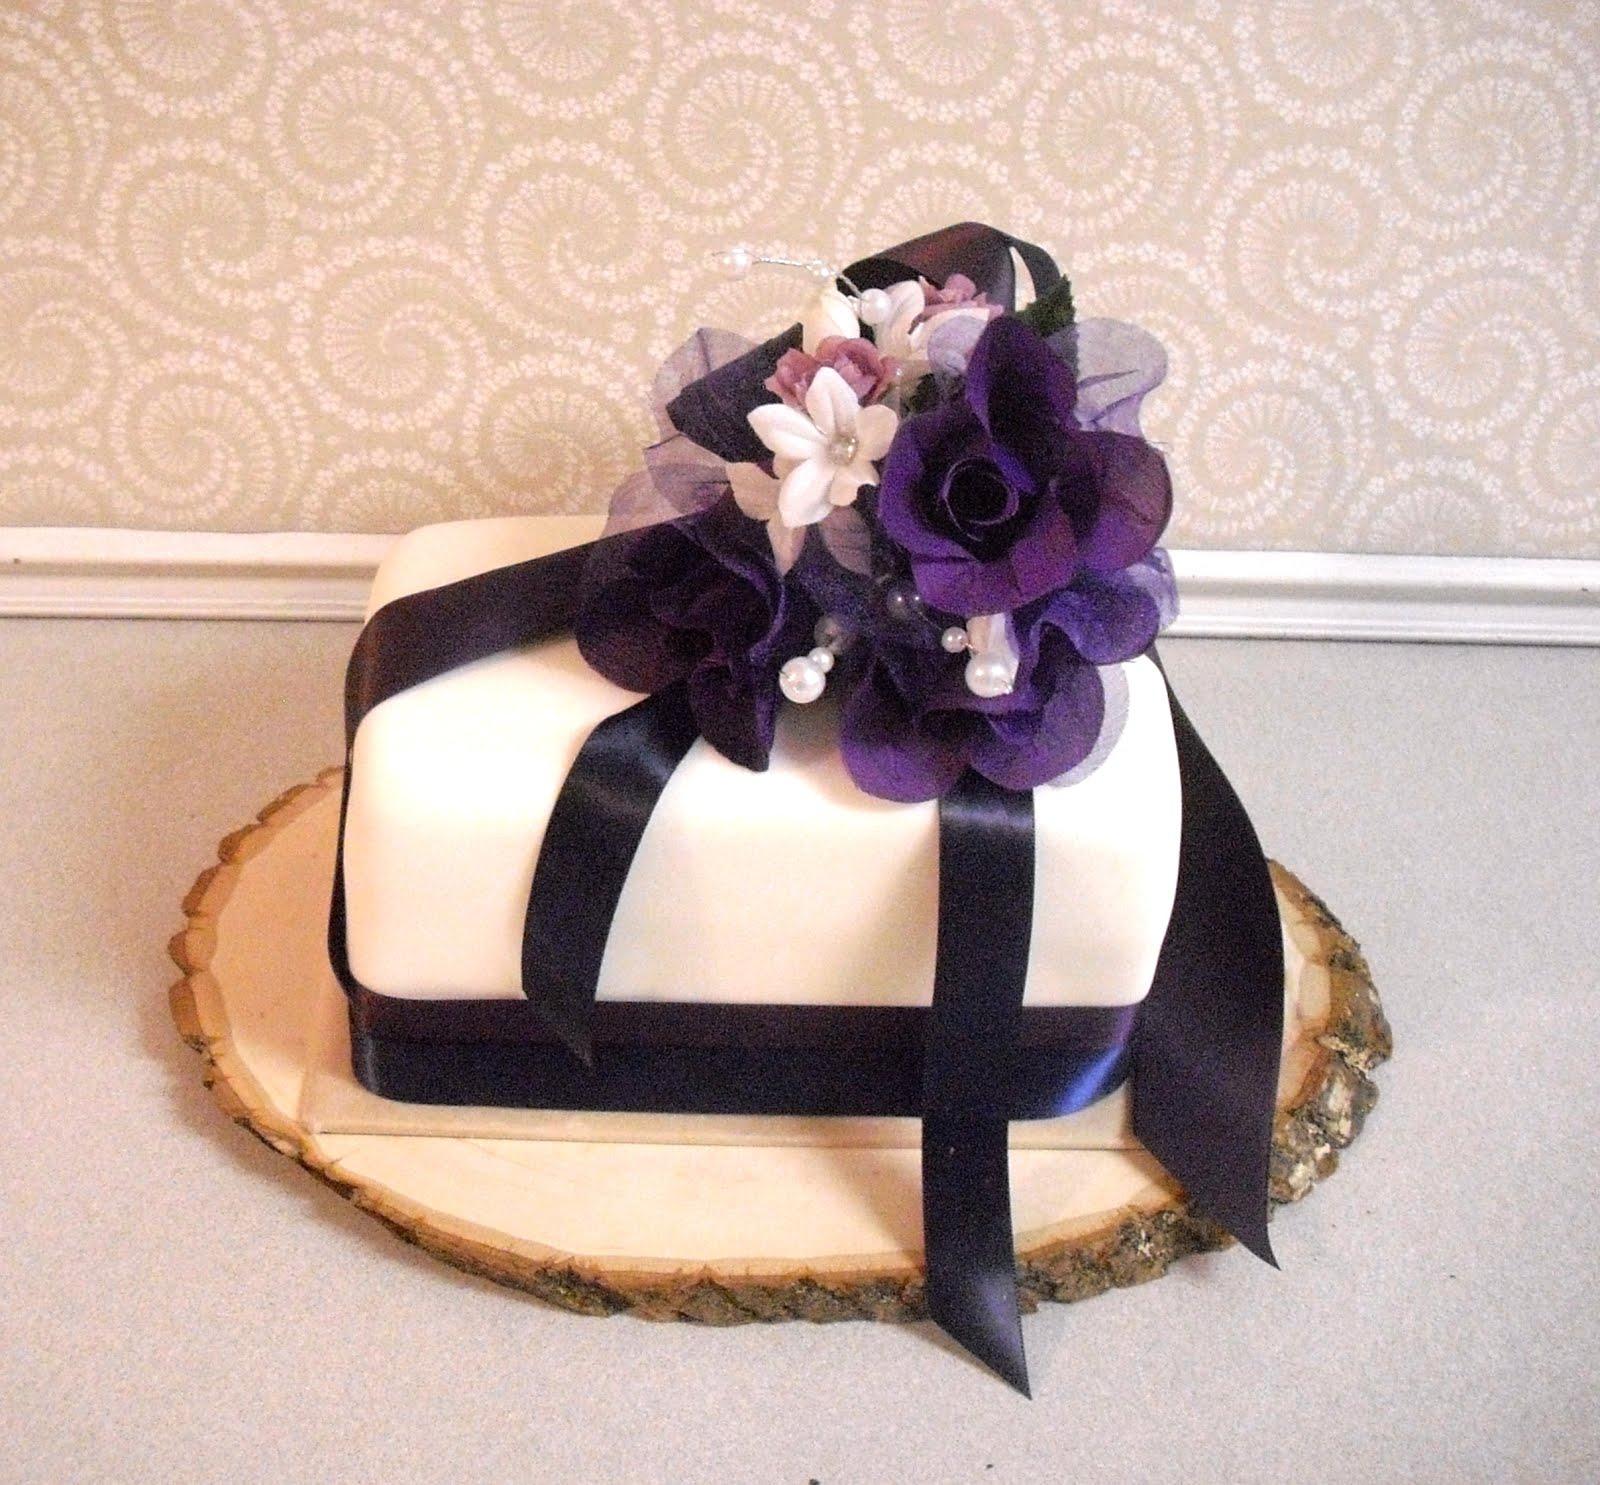 Devanys Designs: Small, Simple, Wedding Cake